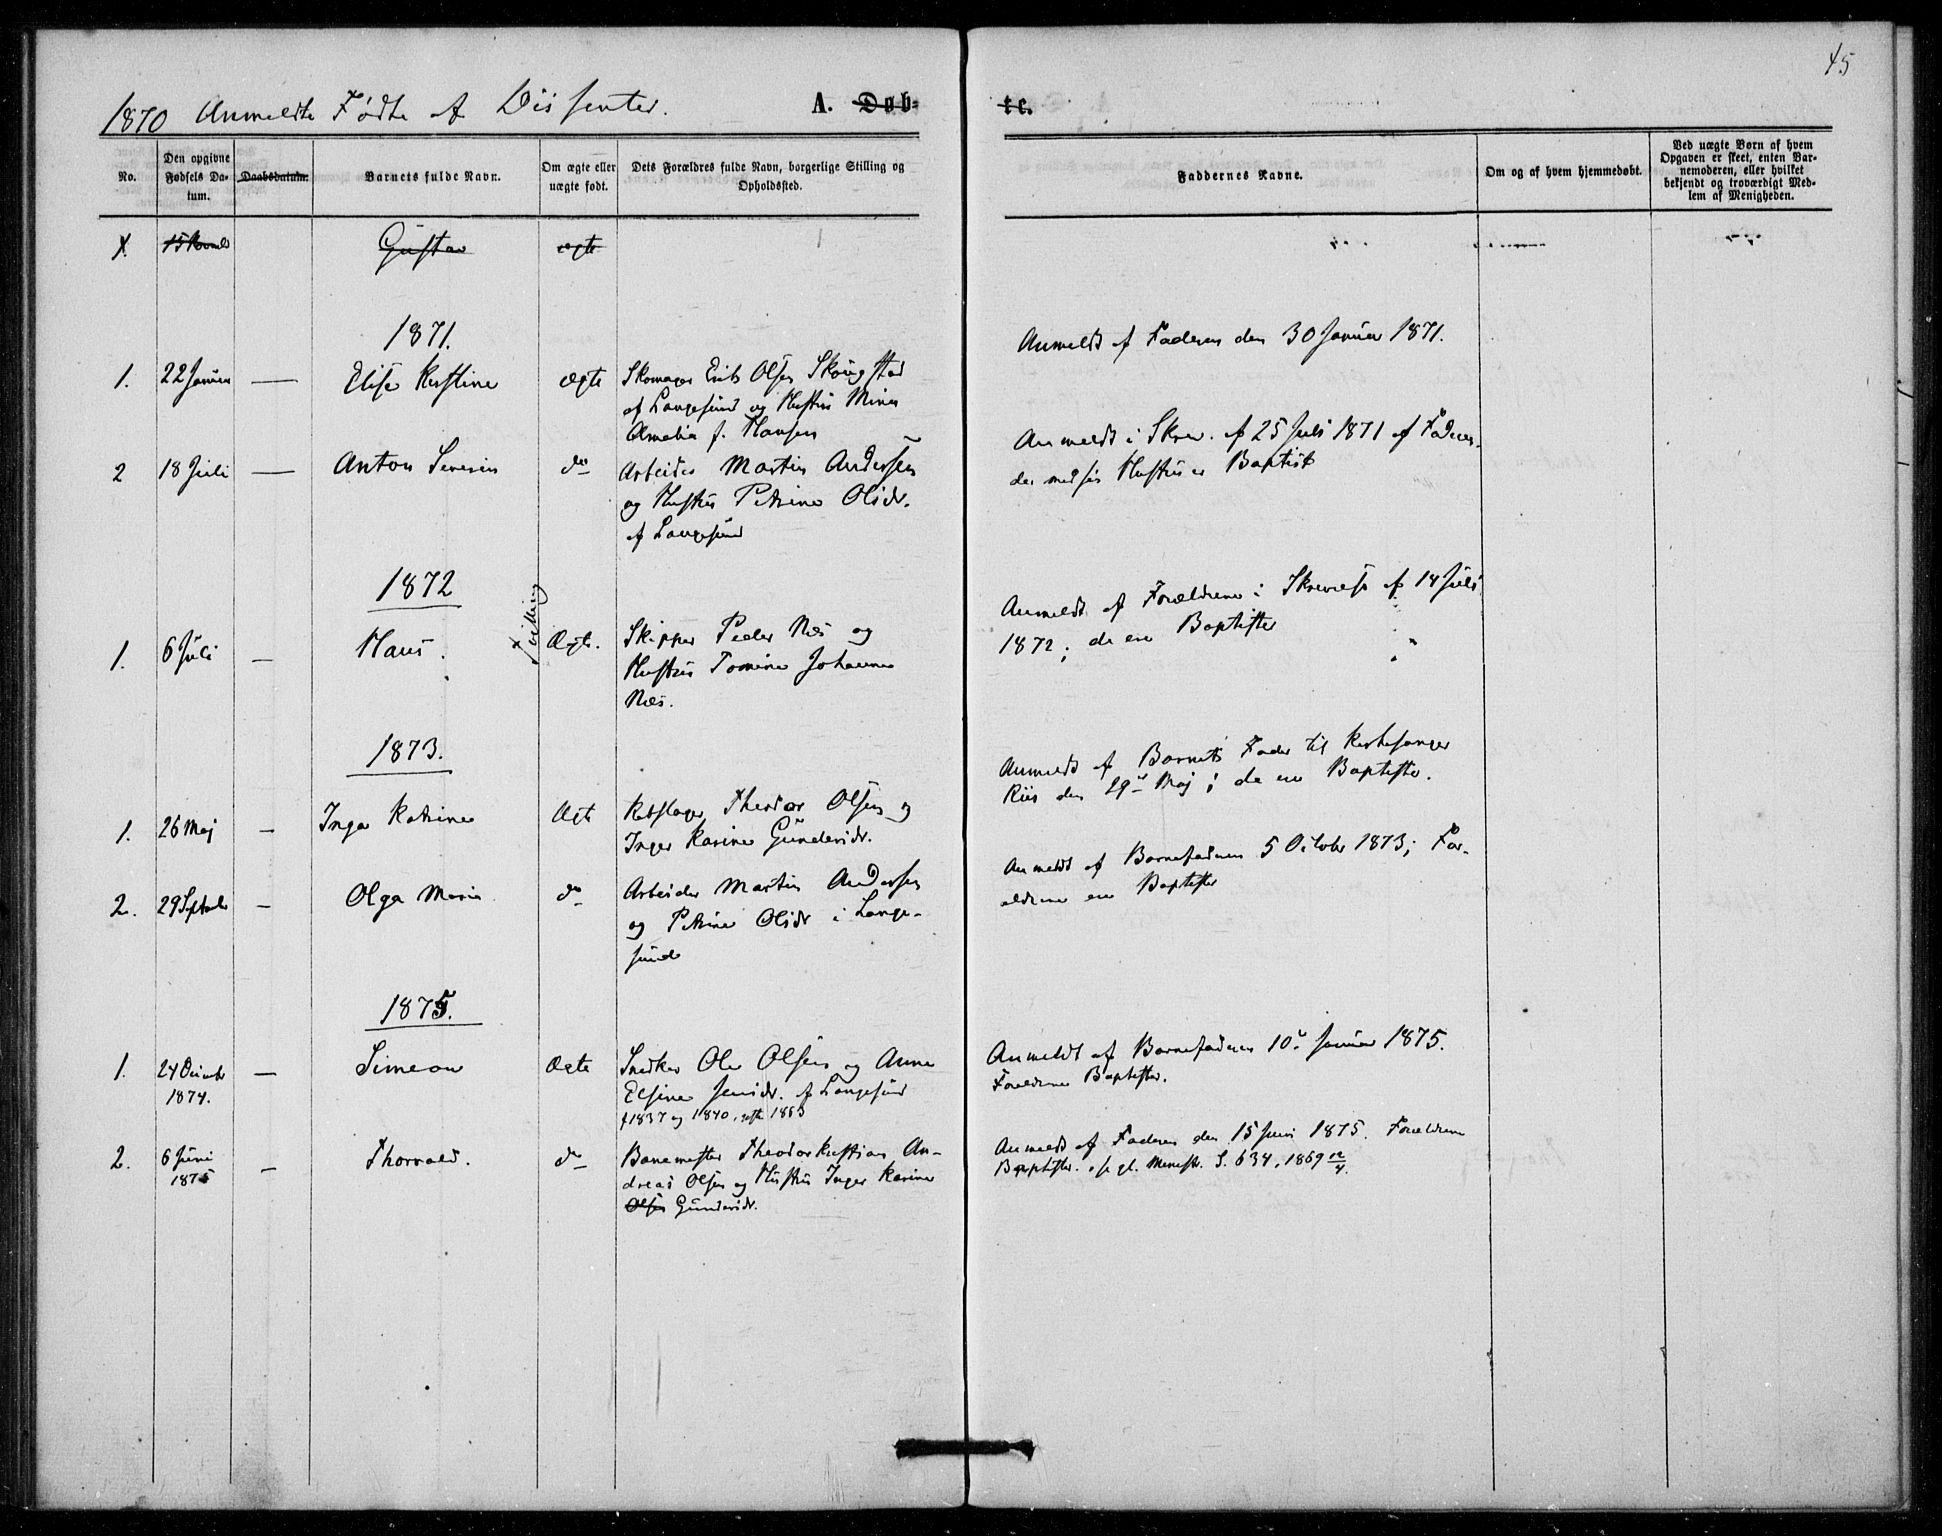 SAKO, Langesund kirkebøker, F/Fa/L0001: Ministerialbok nr. 1, 1870-1877, s. 45